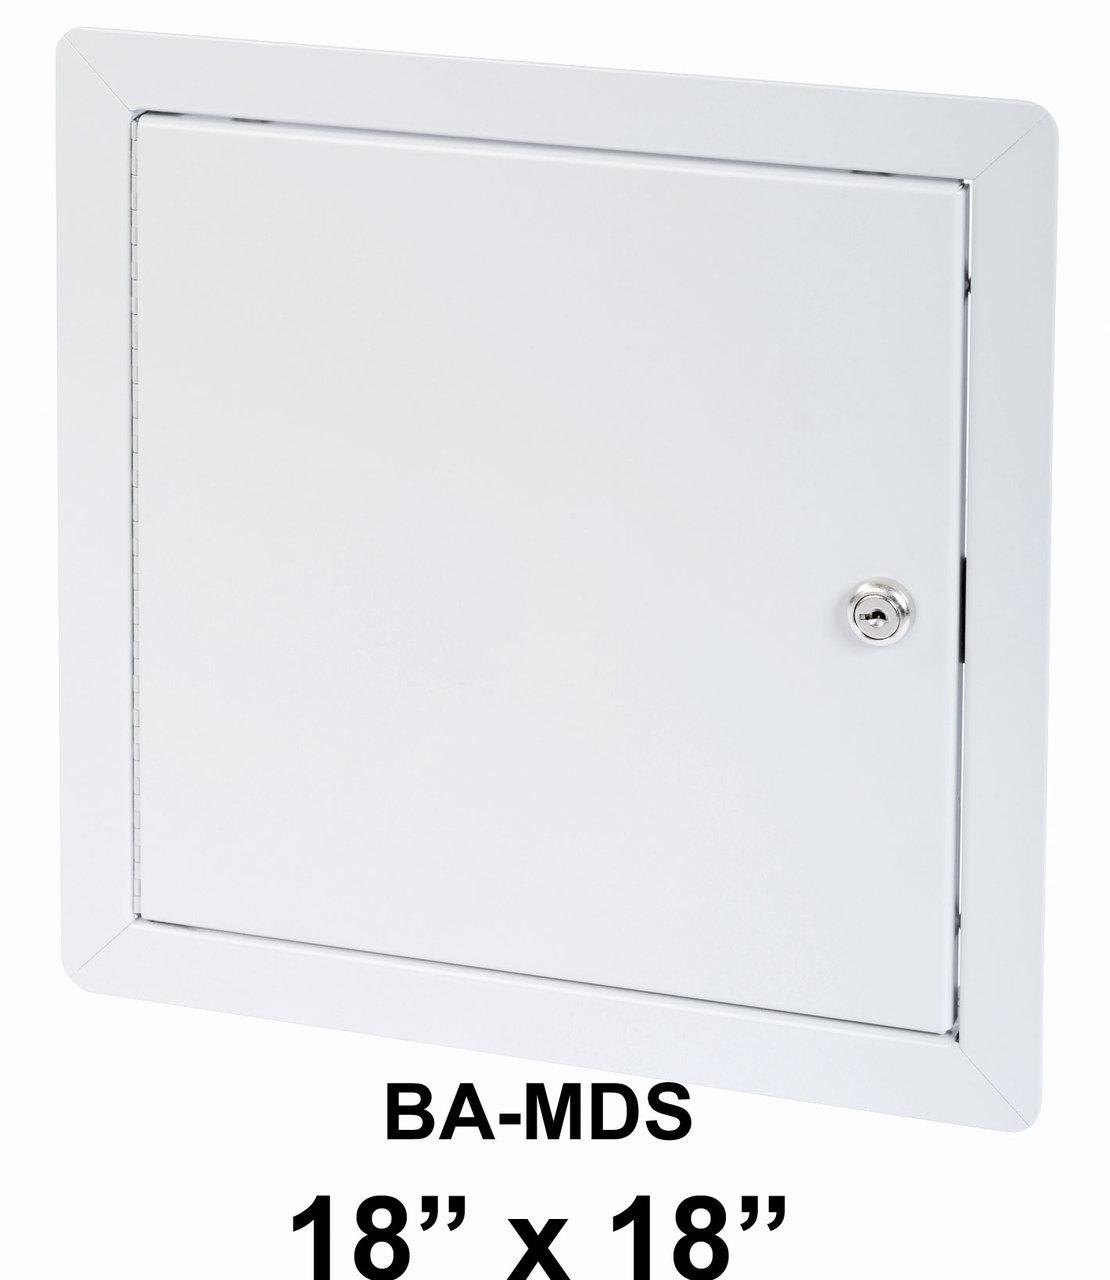 Access Doors 18 x 18 BA-MDS Medium Security Access - BEST